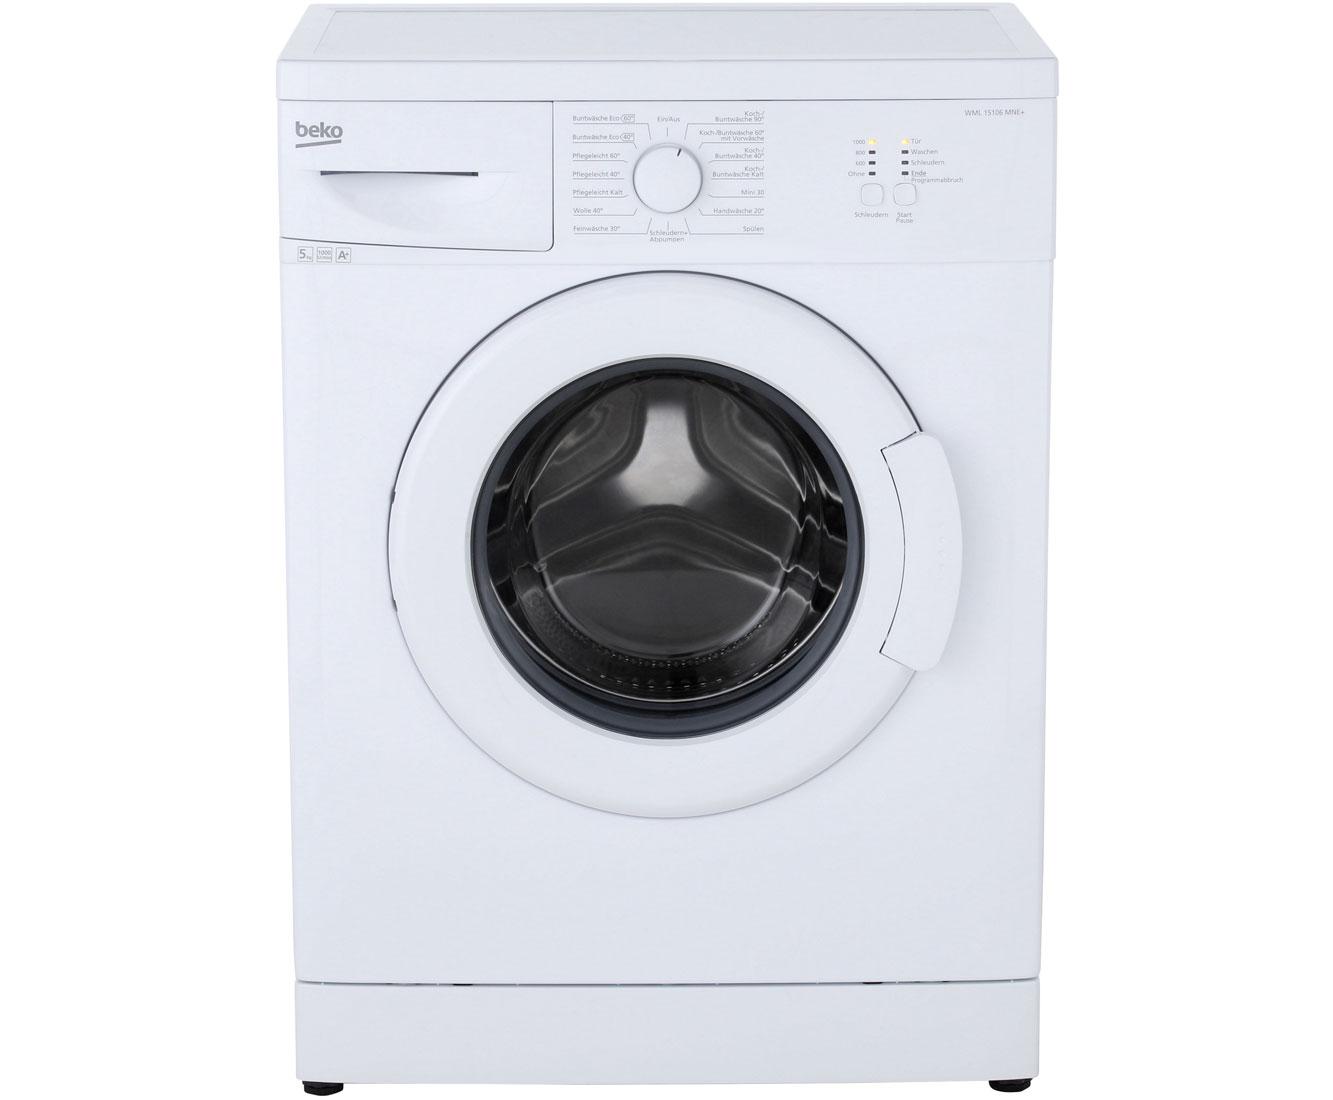 Stunning 5 Kg Waschmaschine Ideas - Thehammondreport.com ...